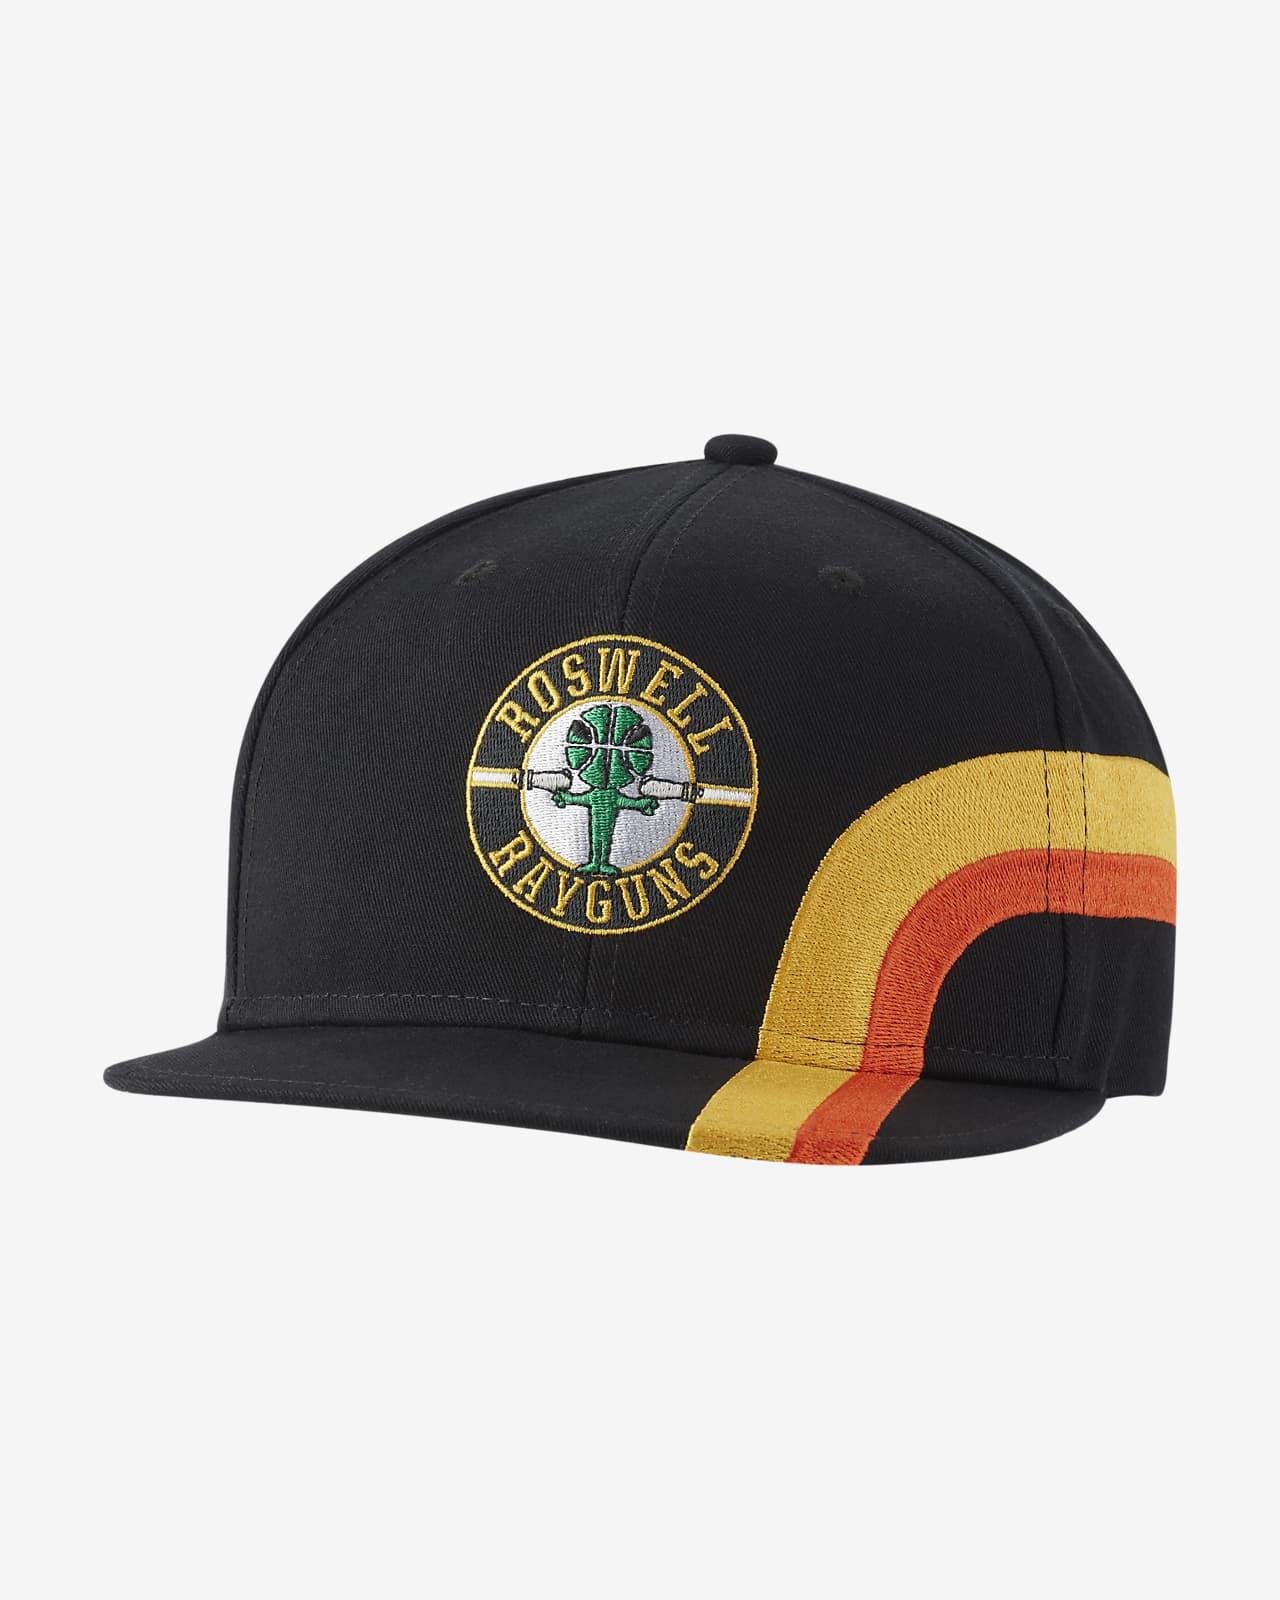 Nike Pro Rayguns Basketbol Şapkası